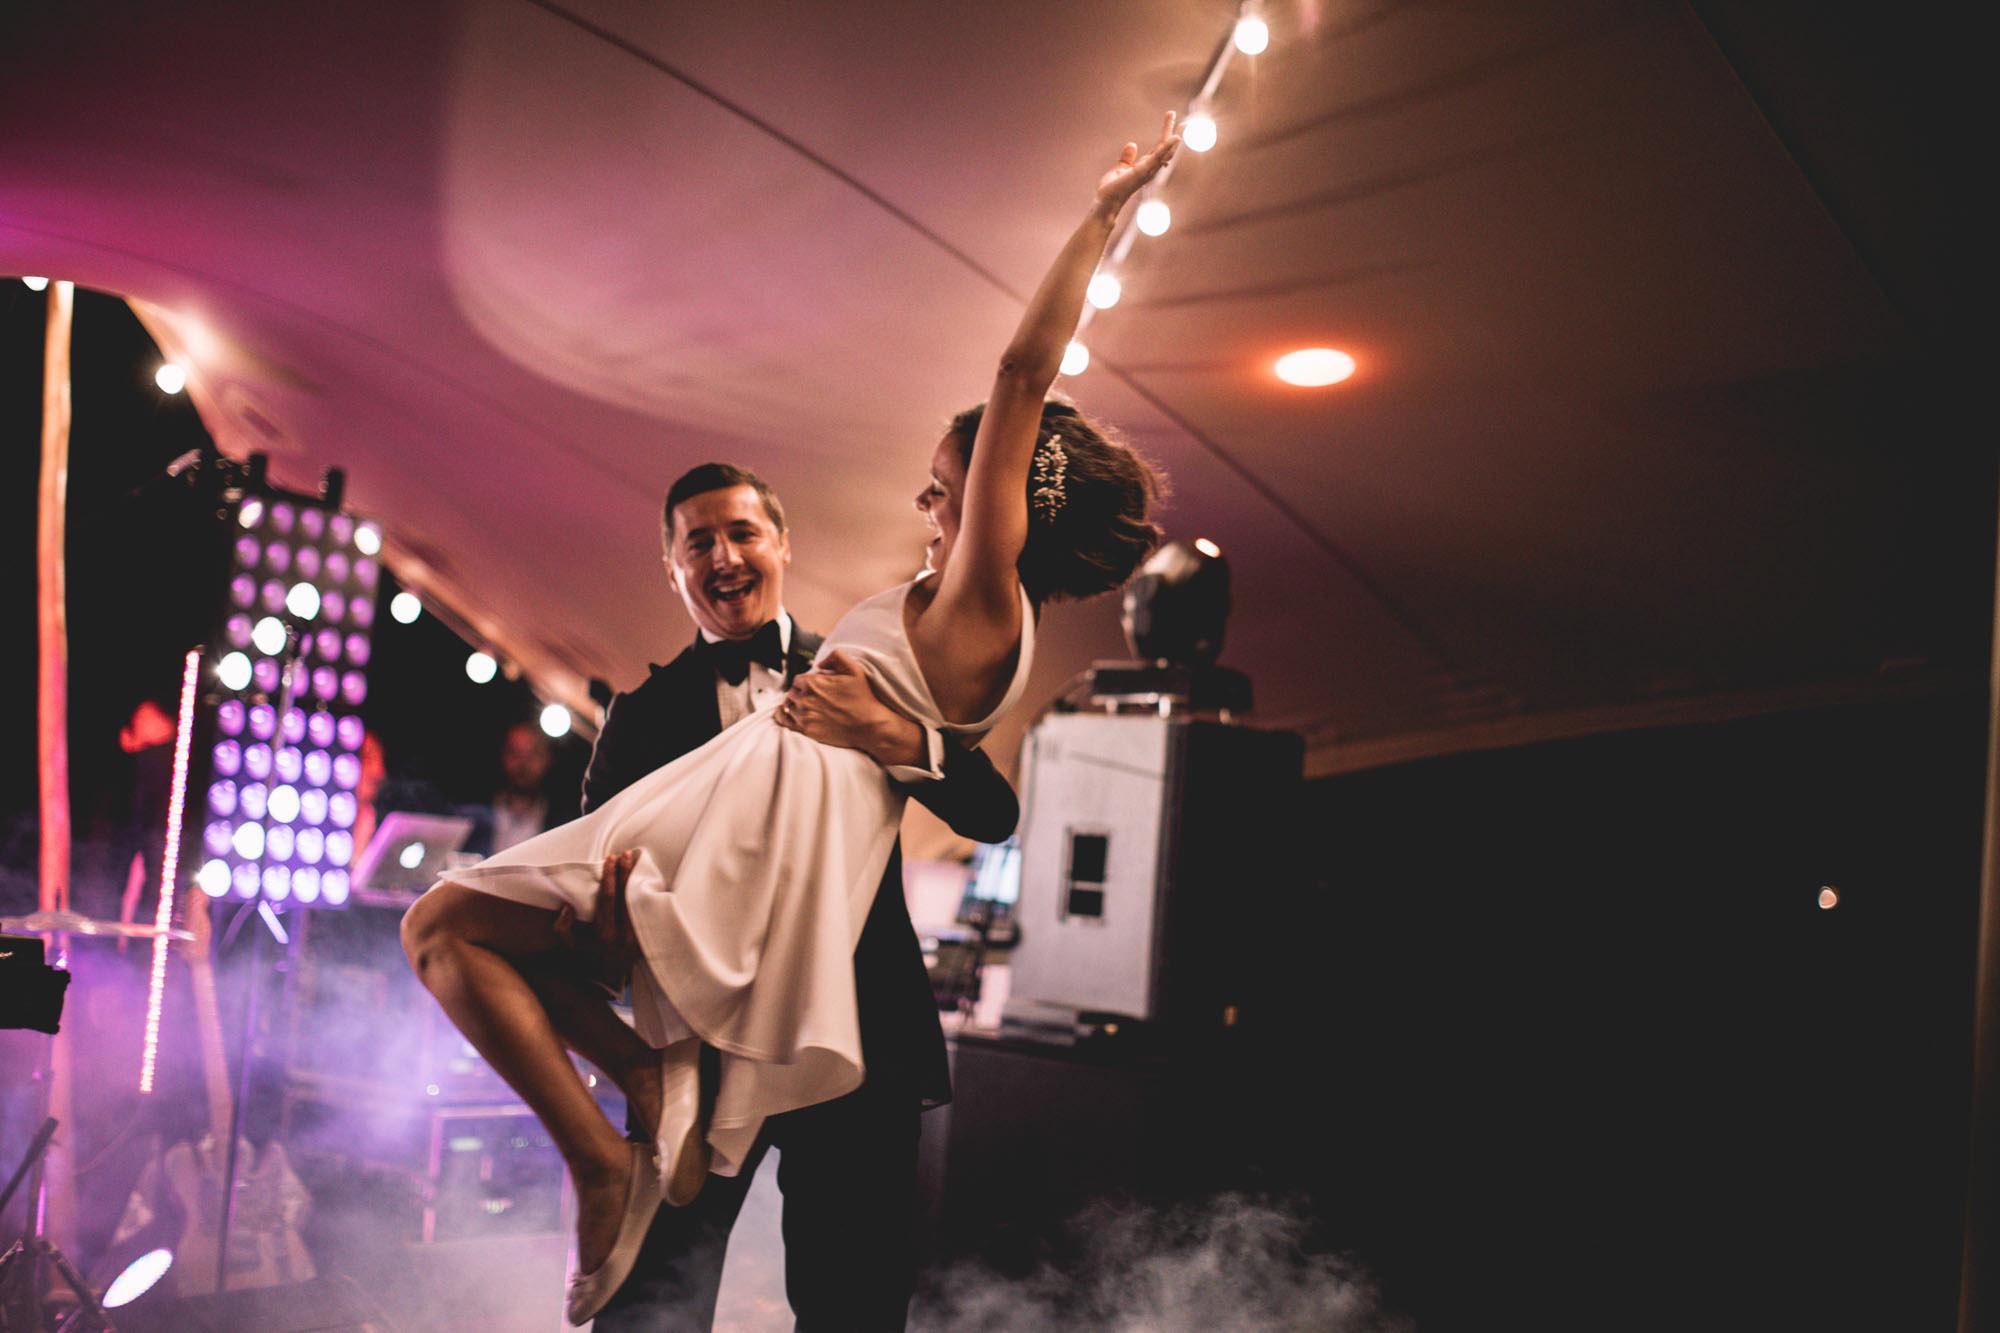 NOEMIE + CATALIN_CHATEAU TALAUD_PHOTOGRAPHE MARIAGE_LES BANDITS-3